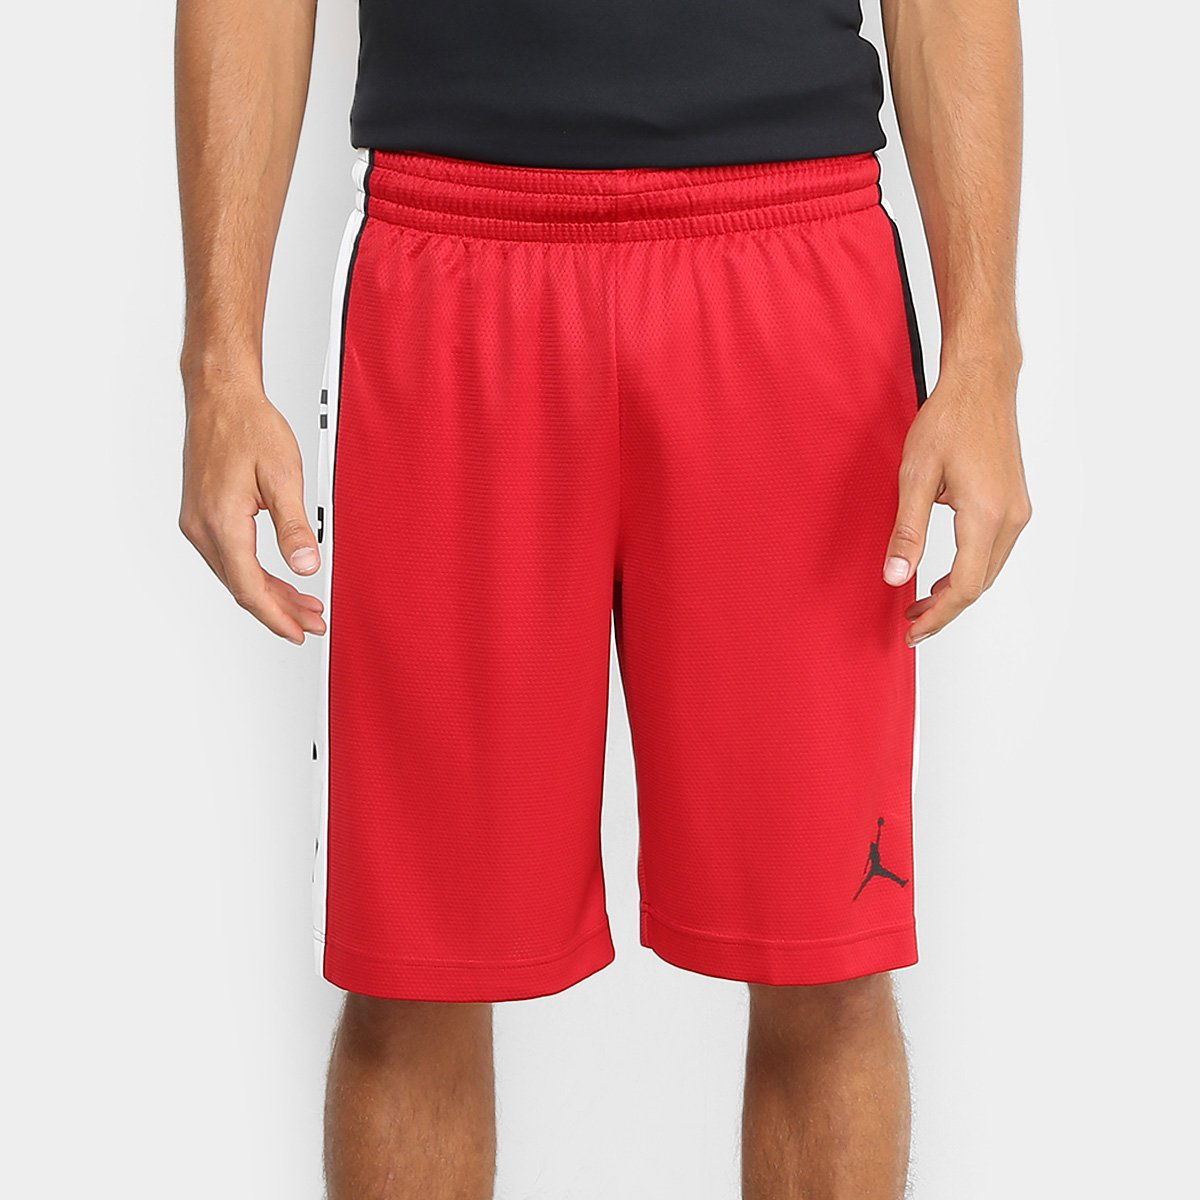 784c5c50cf939 Short Jordan Nike Graphic Rise Brand Masculino - Compre Agora